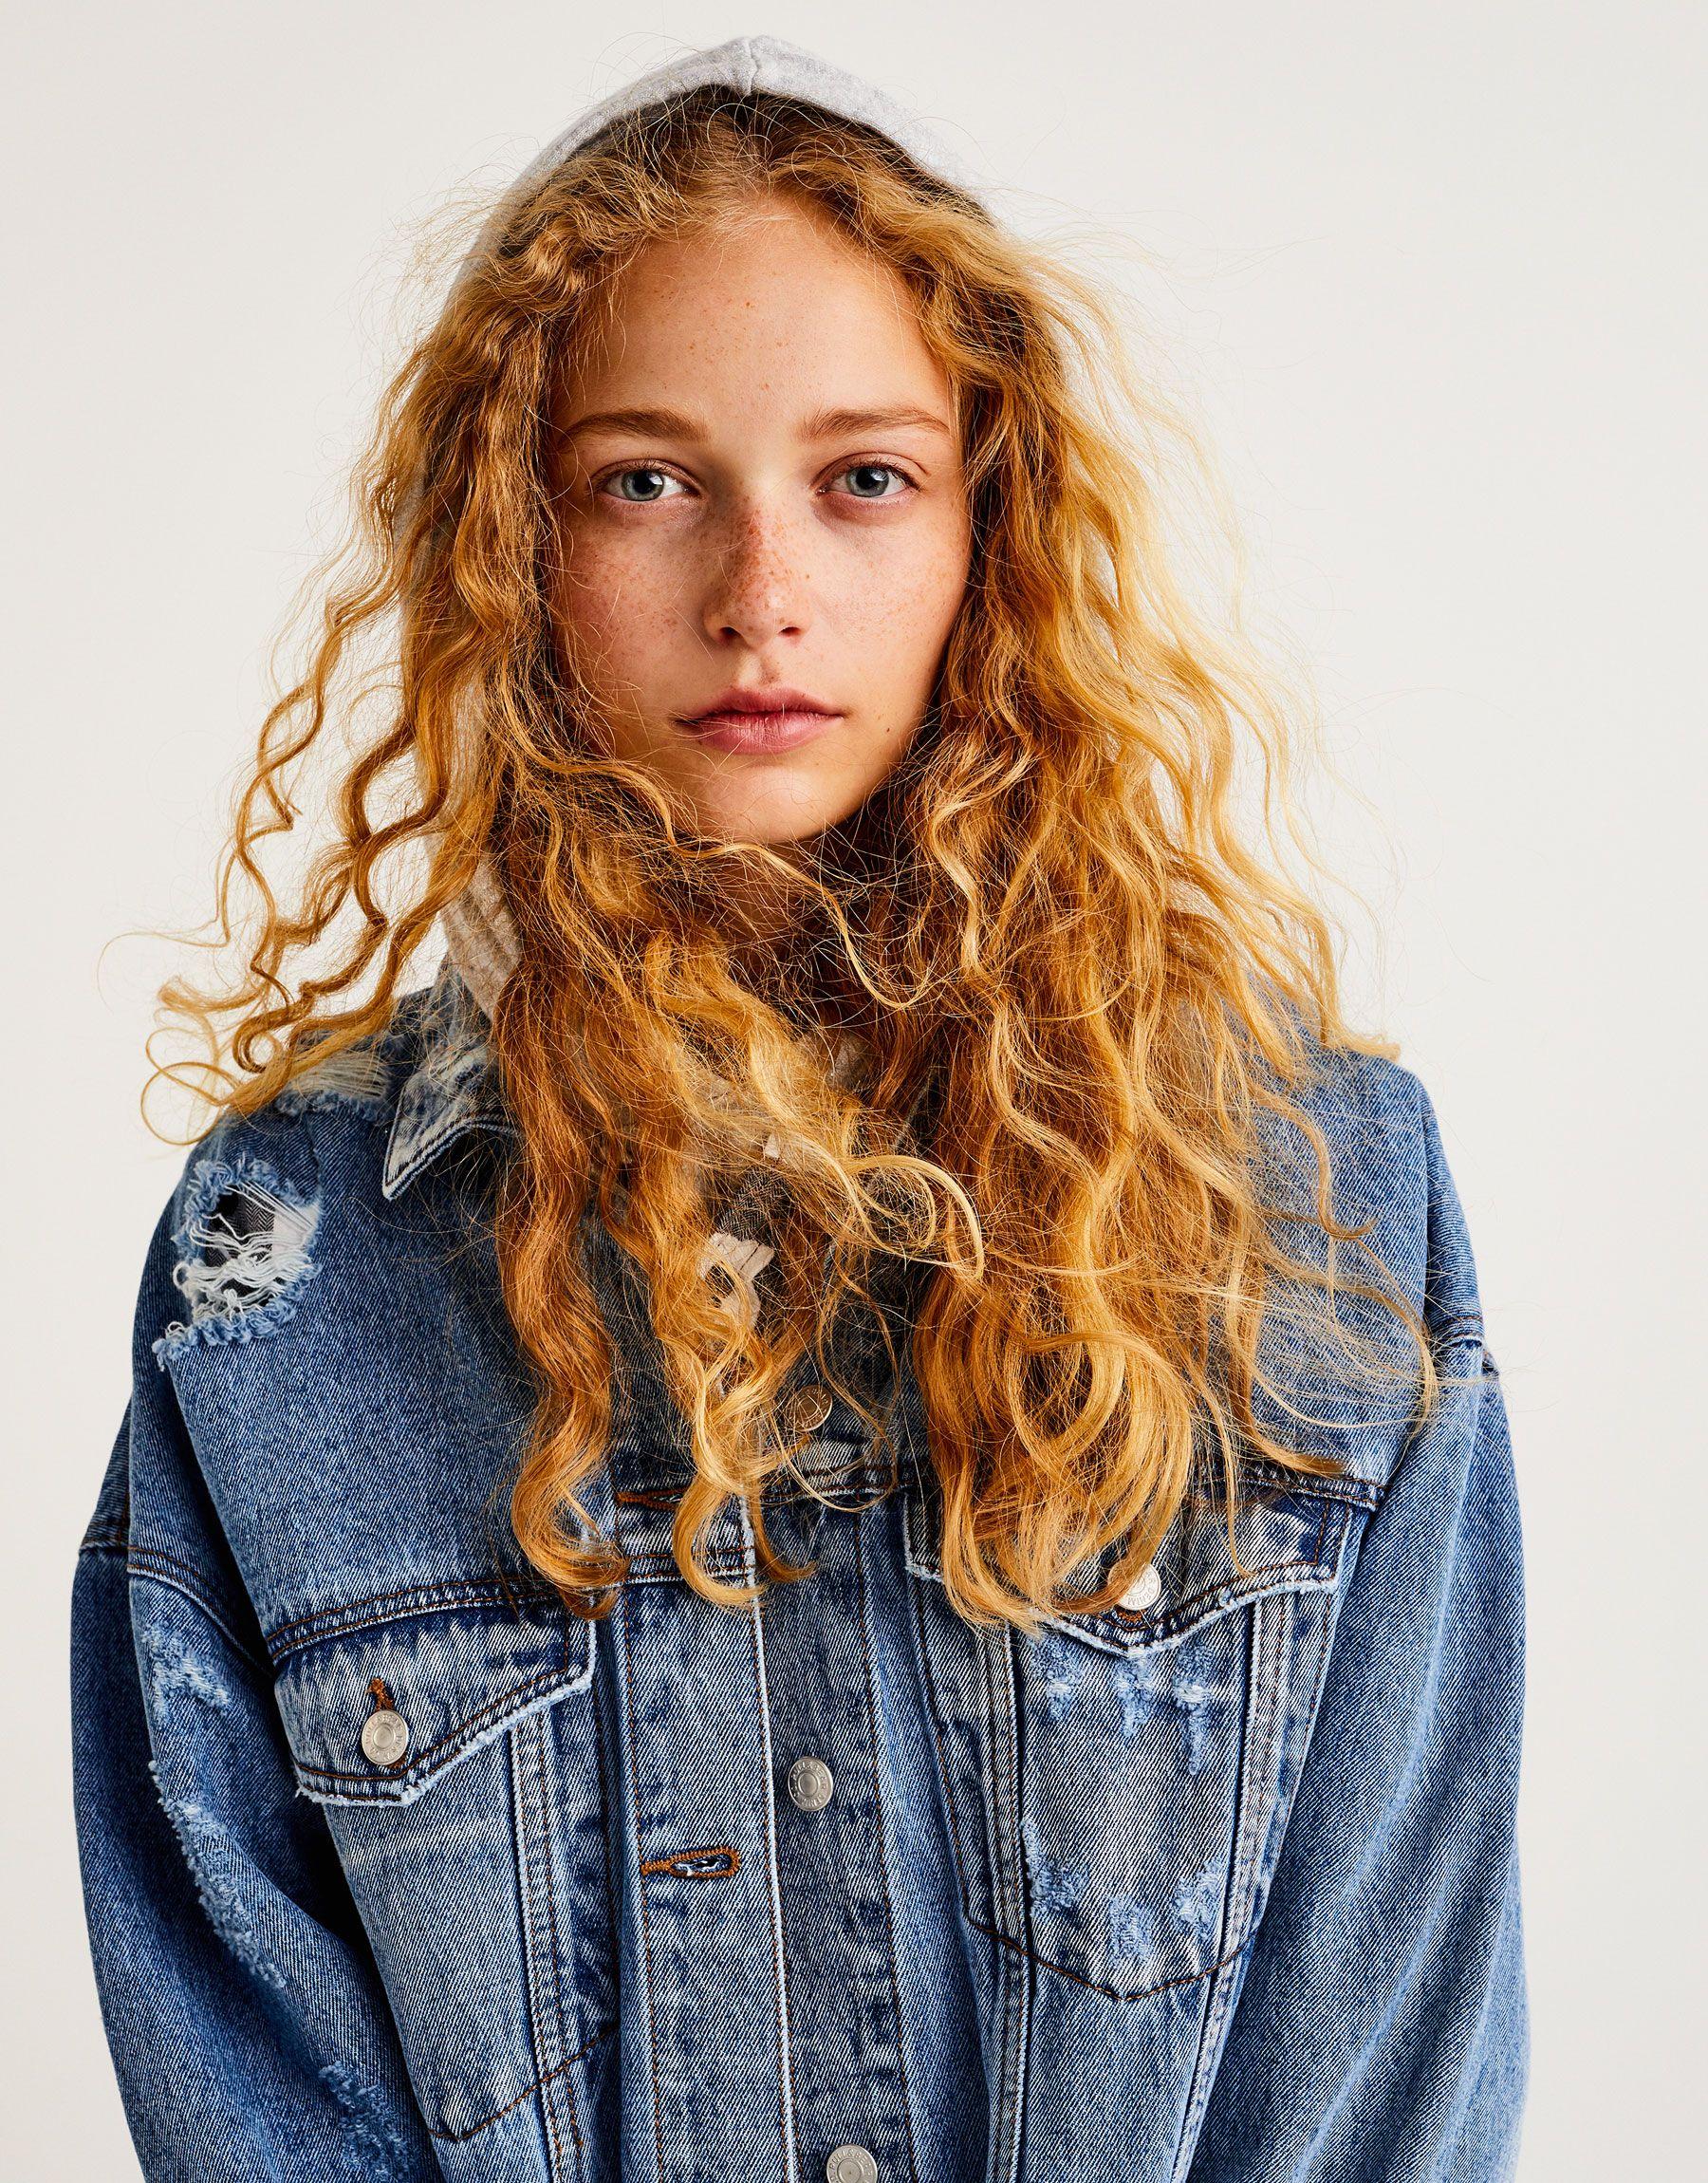 lowest price 8e84e 3b290 Long ripped denim jacket - Coats and jackets - Clothing ...